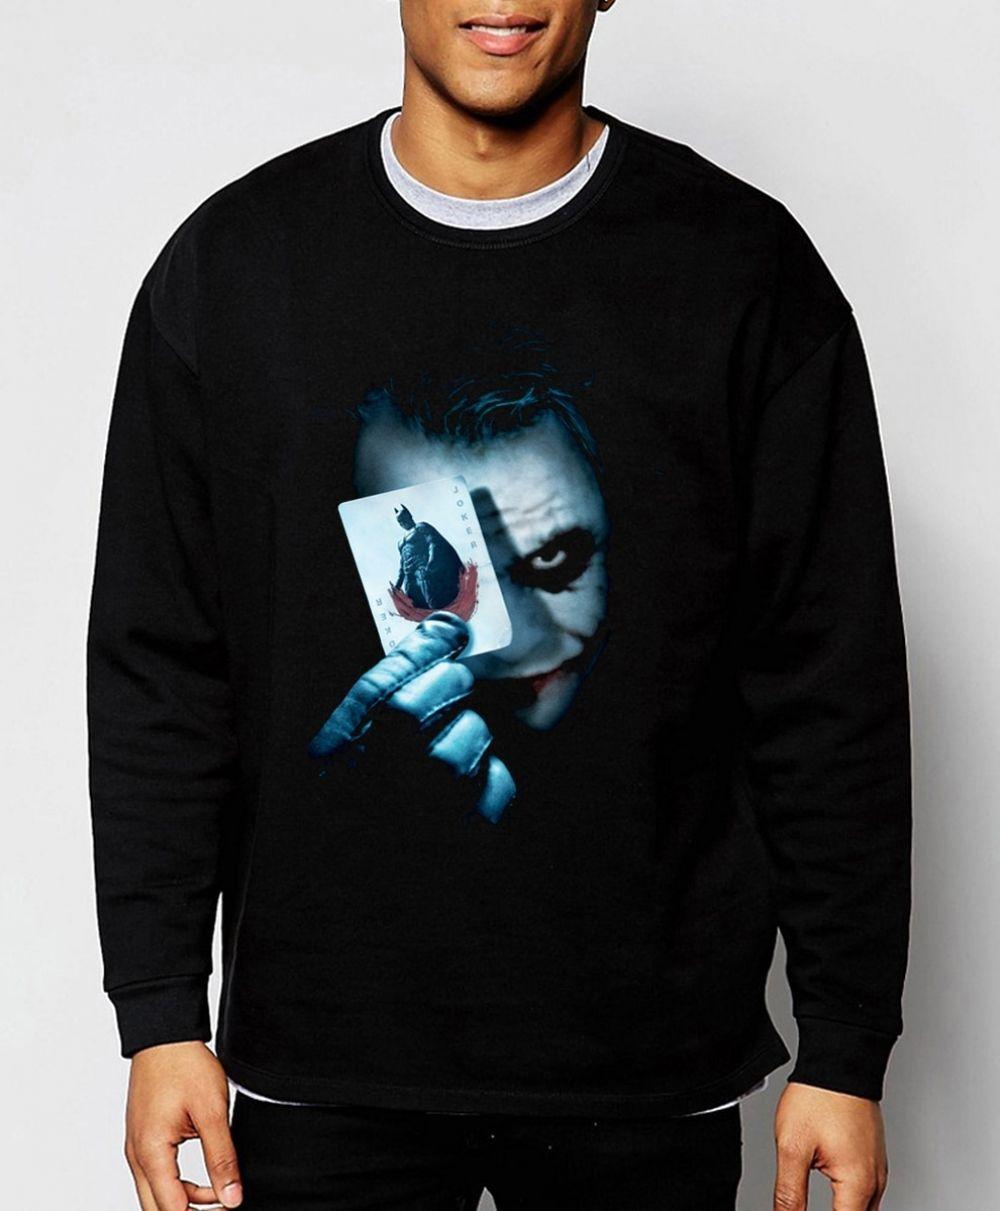 ed31fb240 Joker Heath Ledger Batman 2 The Dark Knight Rises 2019 new spring winter  fashion men sweatshirt hoodie cool streetwear tracksuit Price: 22.20  #fashion